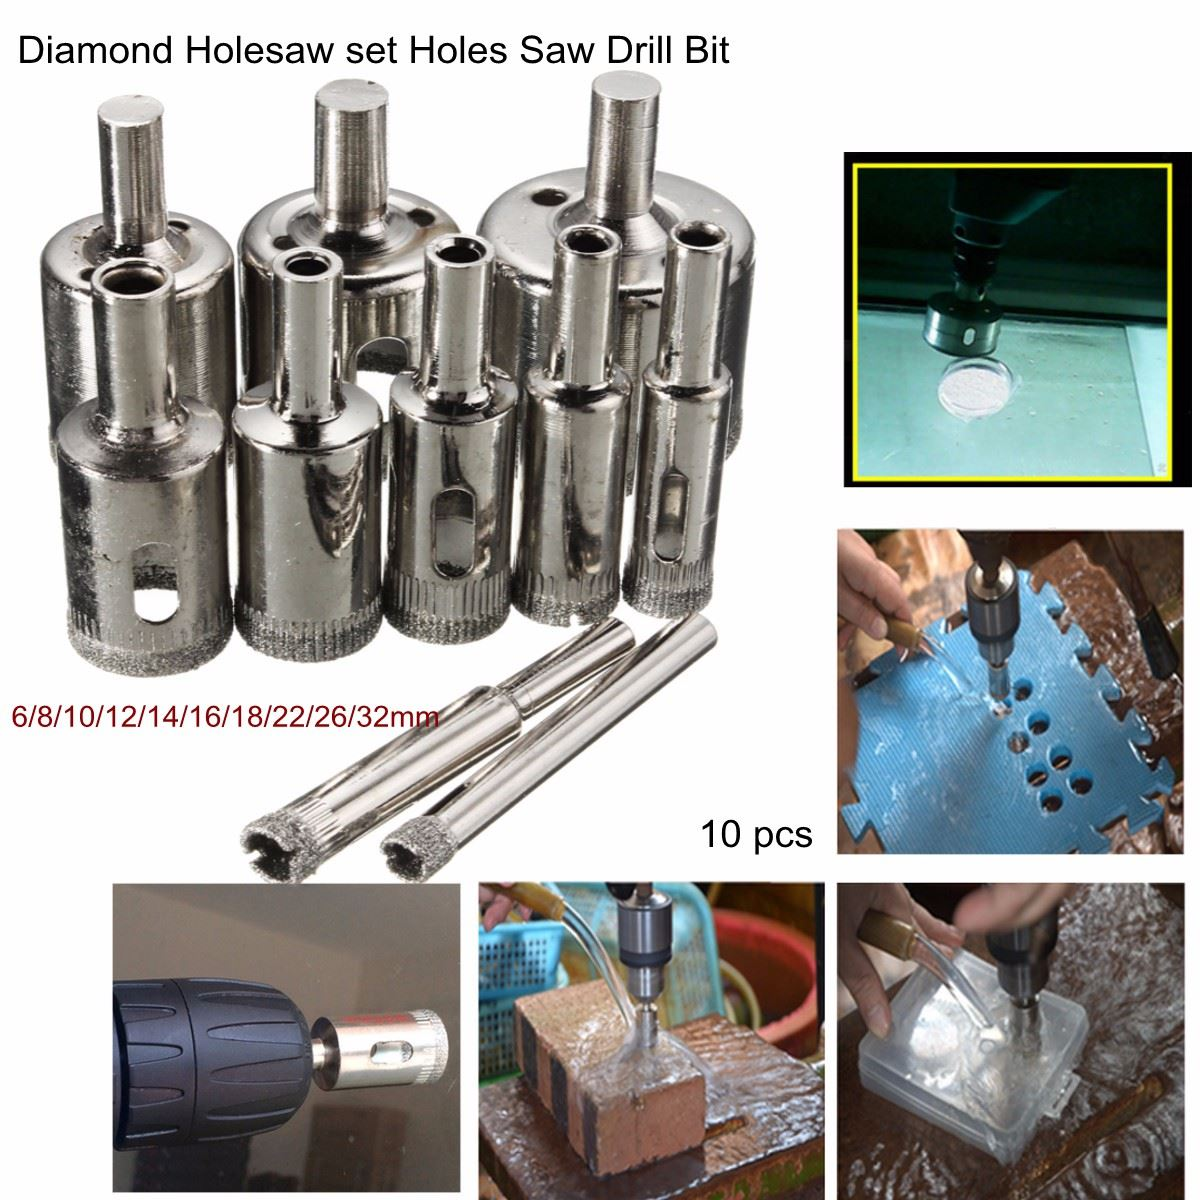 10pcs/set Diamond Holesaw Drill Bit 6-32mm Set For Tile Ceramic Porcelain Glass Marble Top Quality 10pcs set diamond holesaw 3 50mm core drill bit set tile ceramic porcelain marble glass top quality